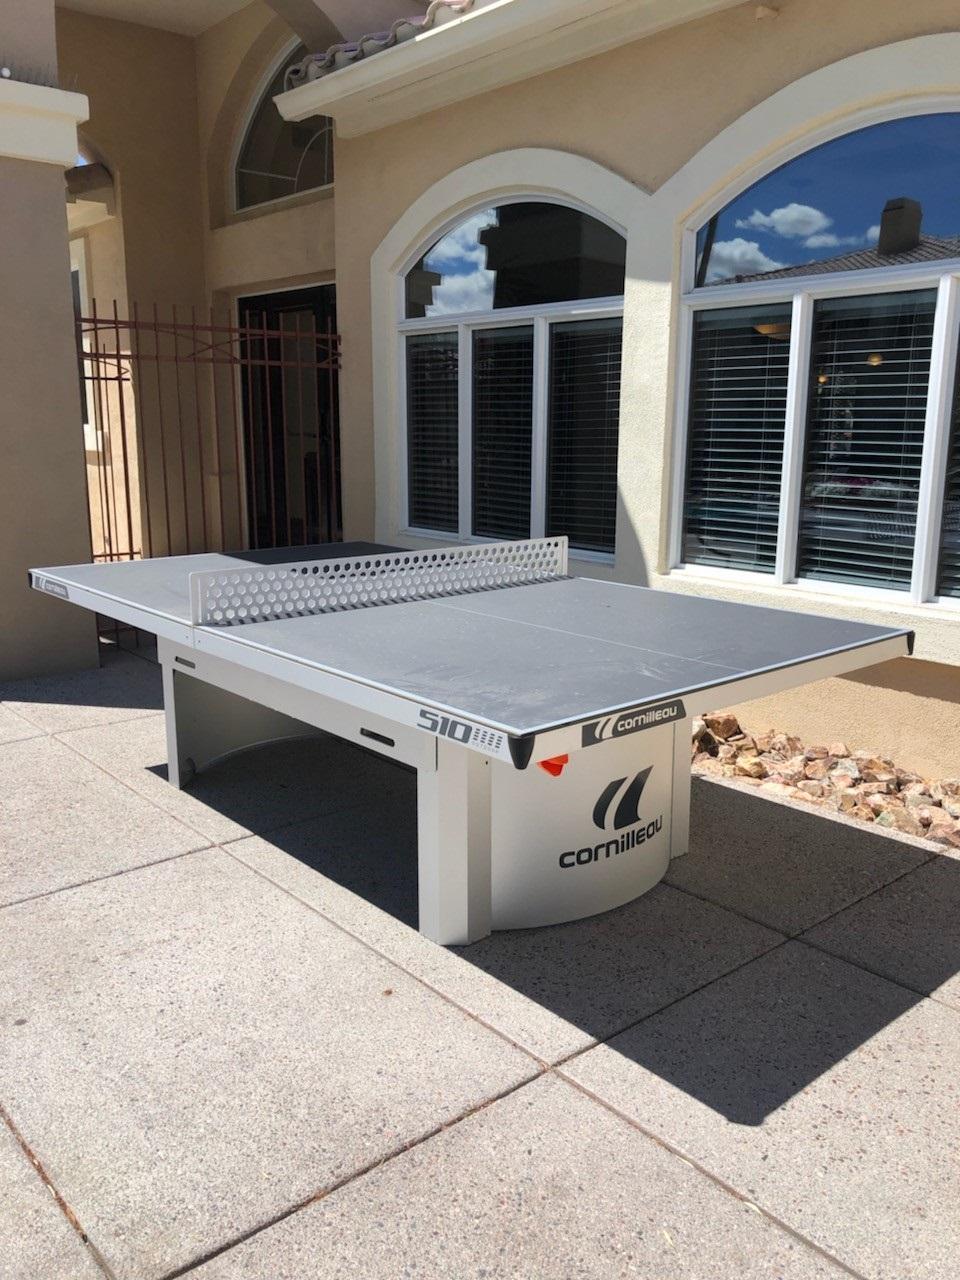 cornilleau 510 ping pong table las vegas nevada